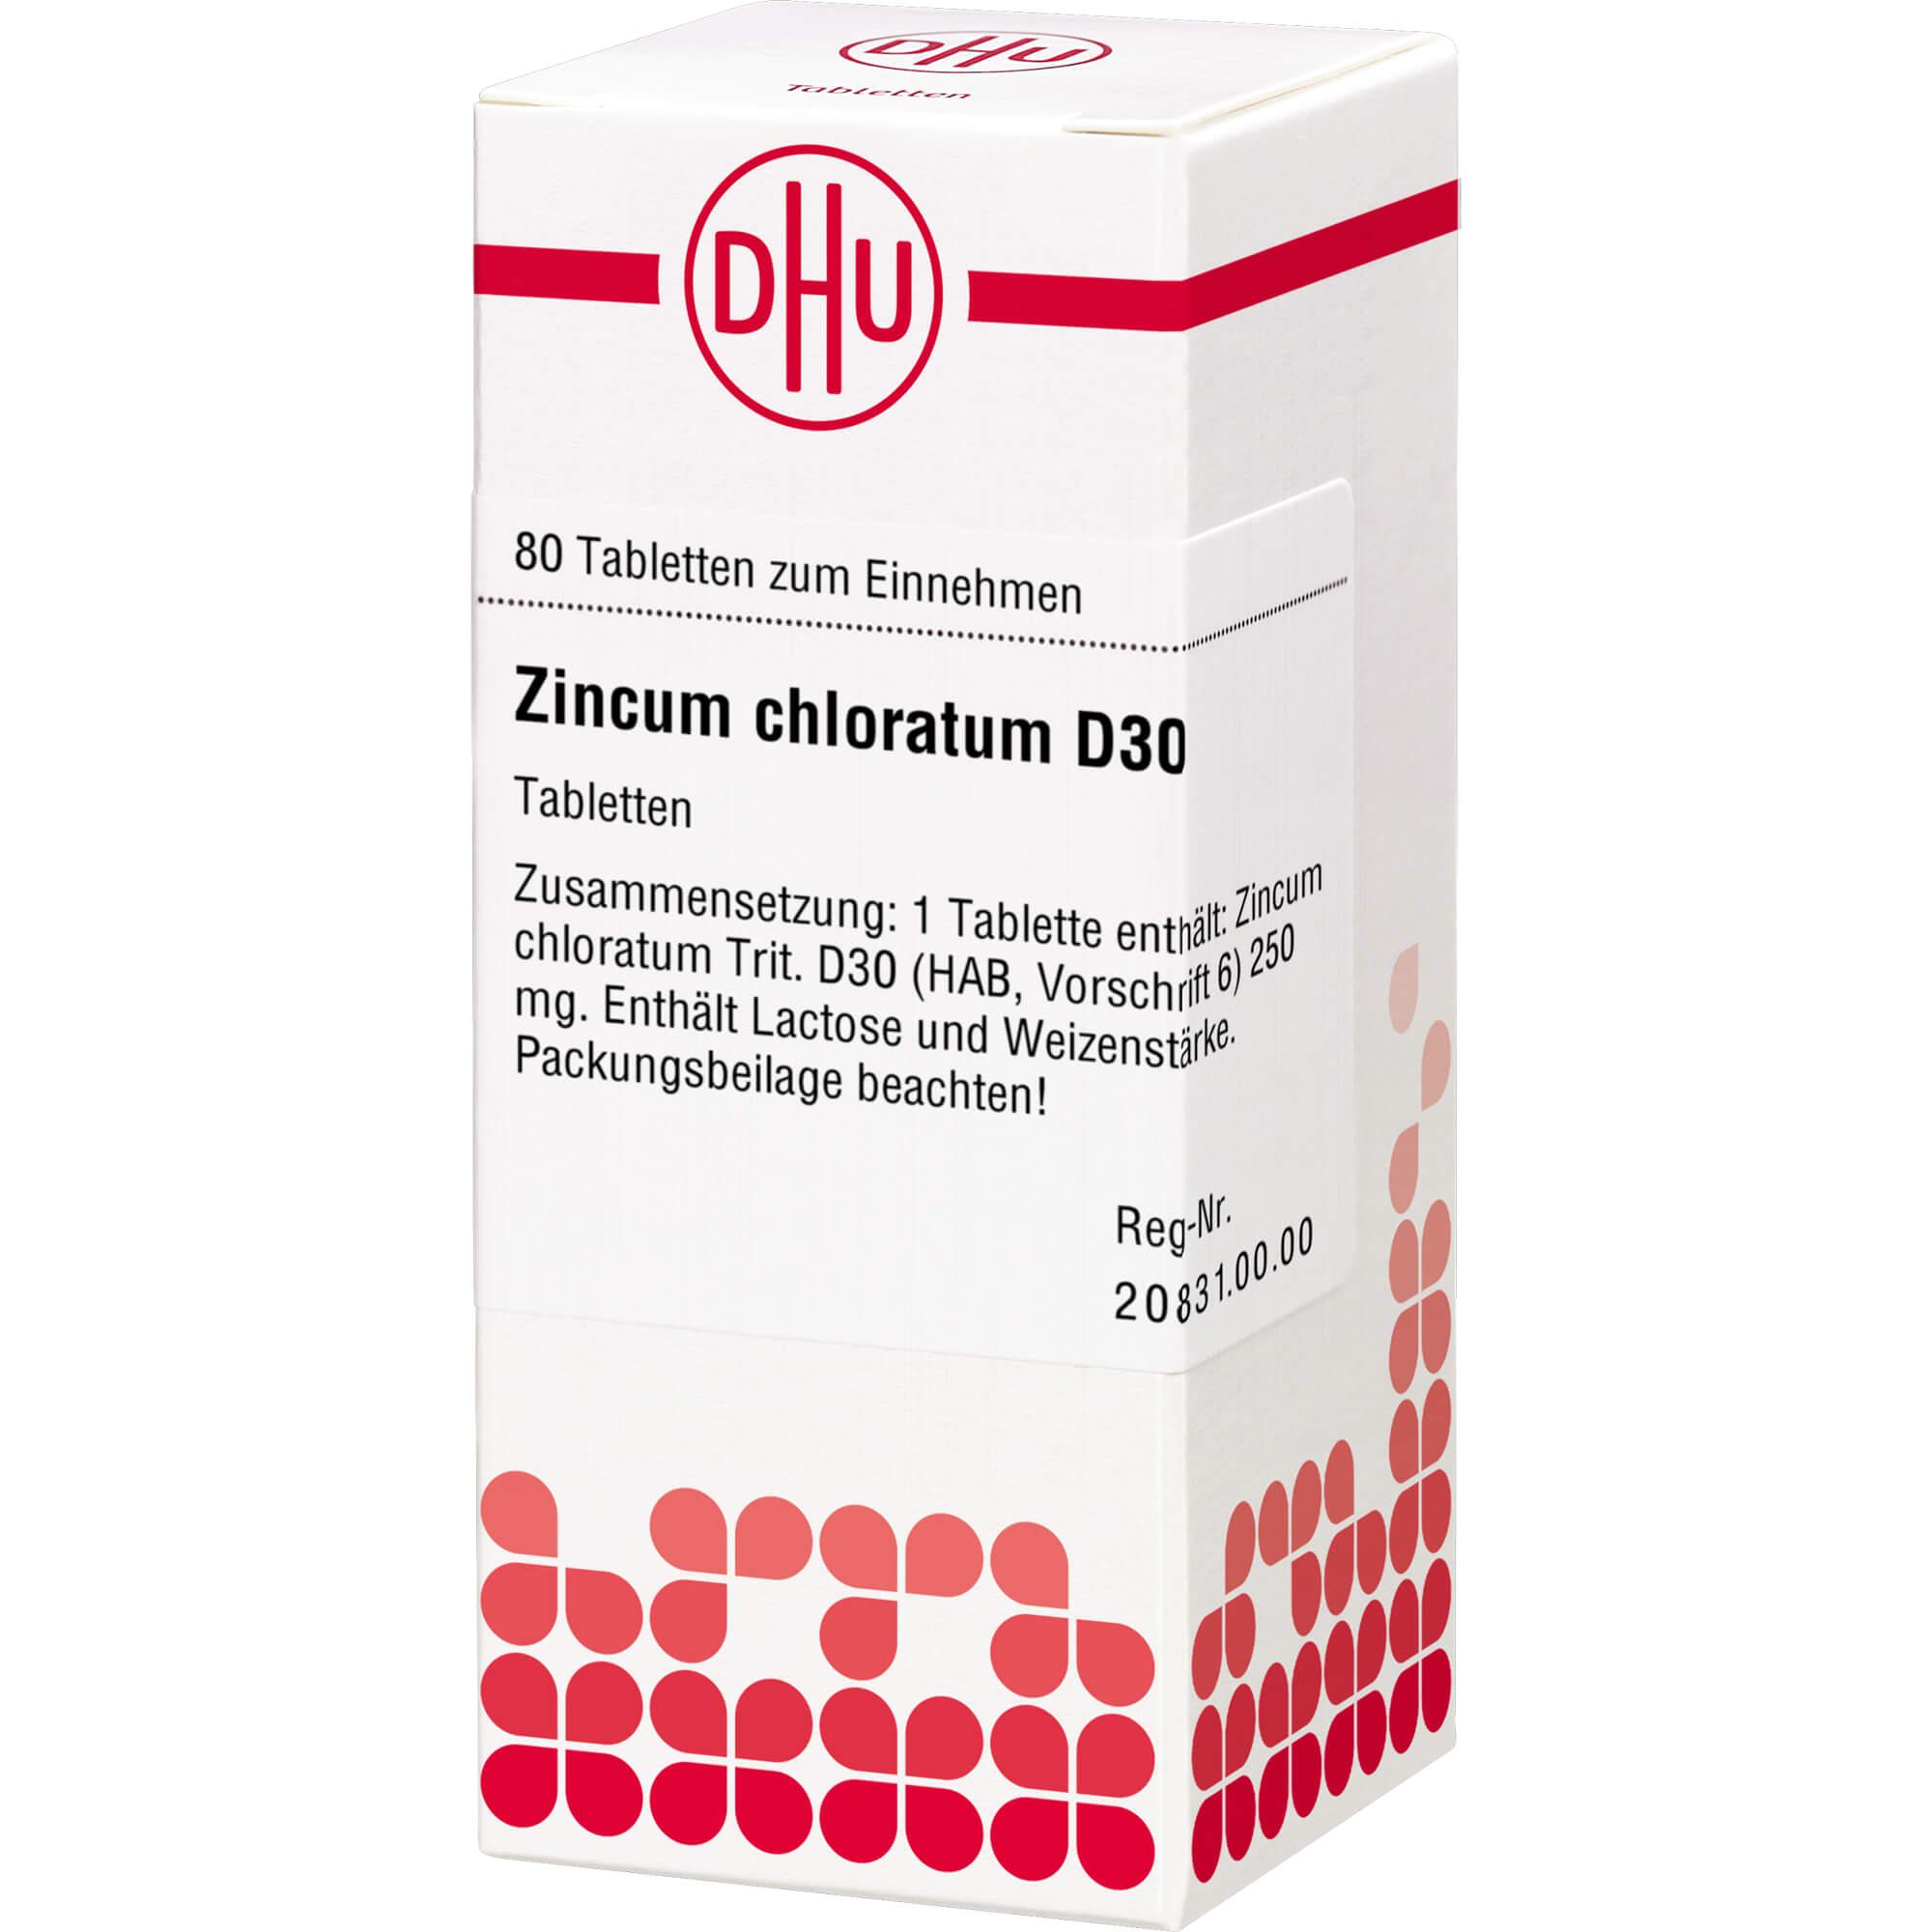 ZINCUM CHLORATUM D 30 Tabletten